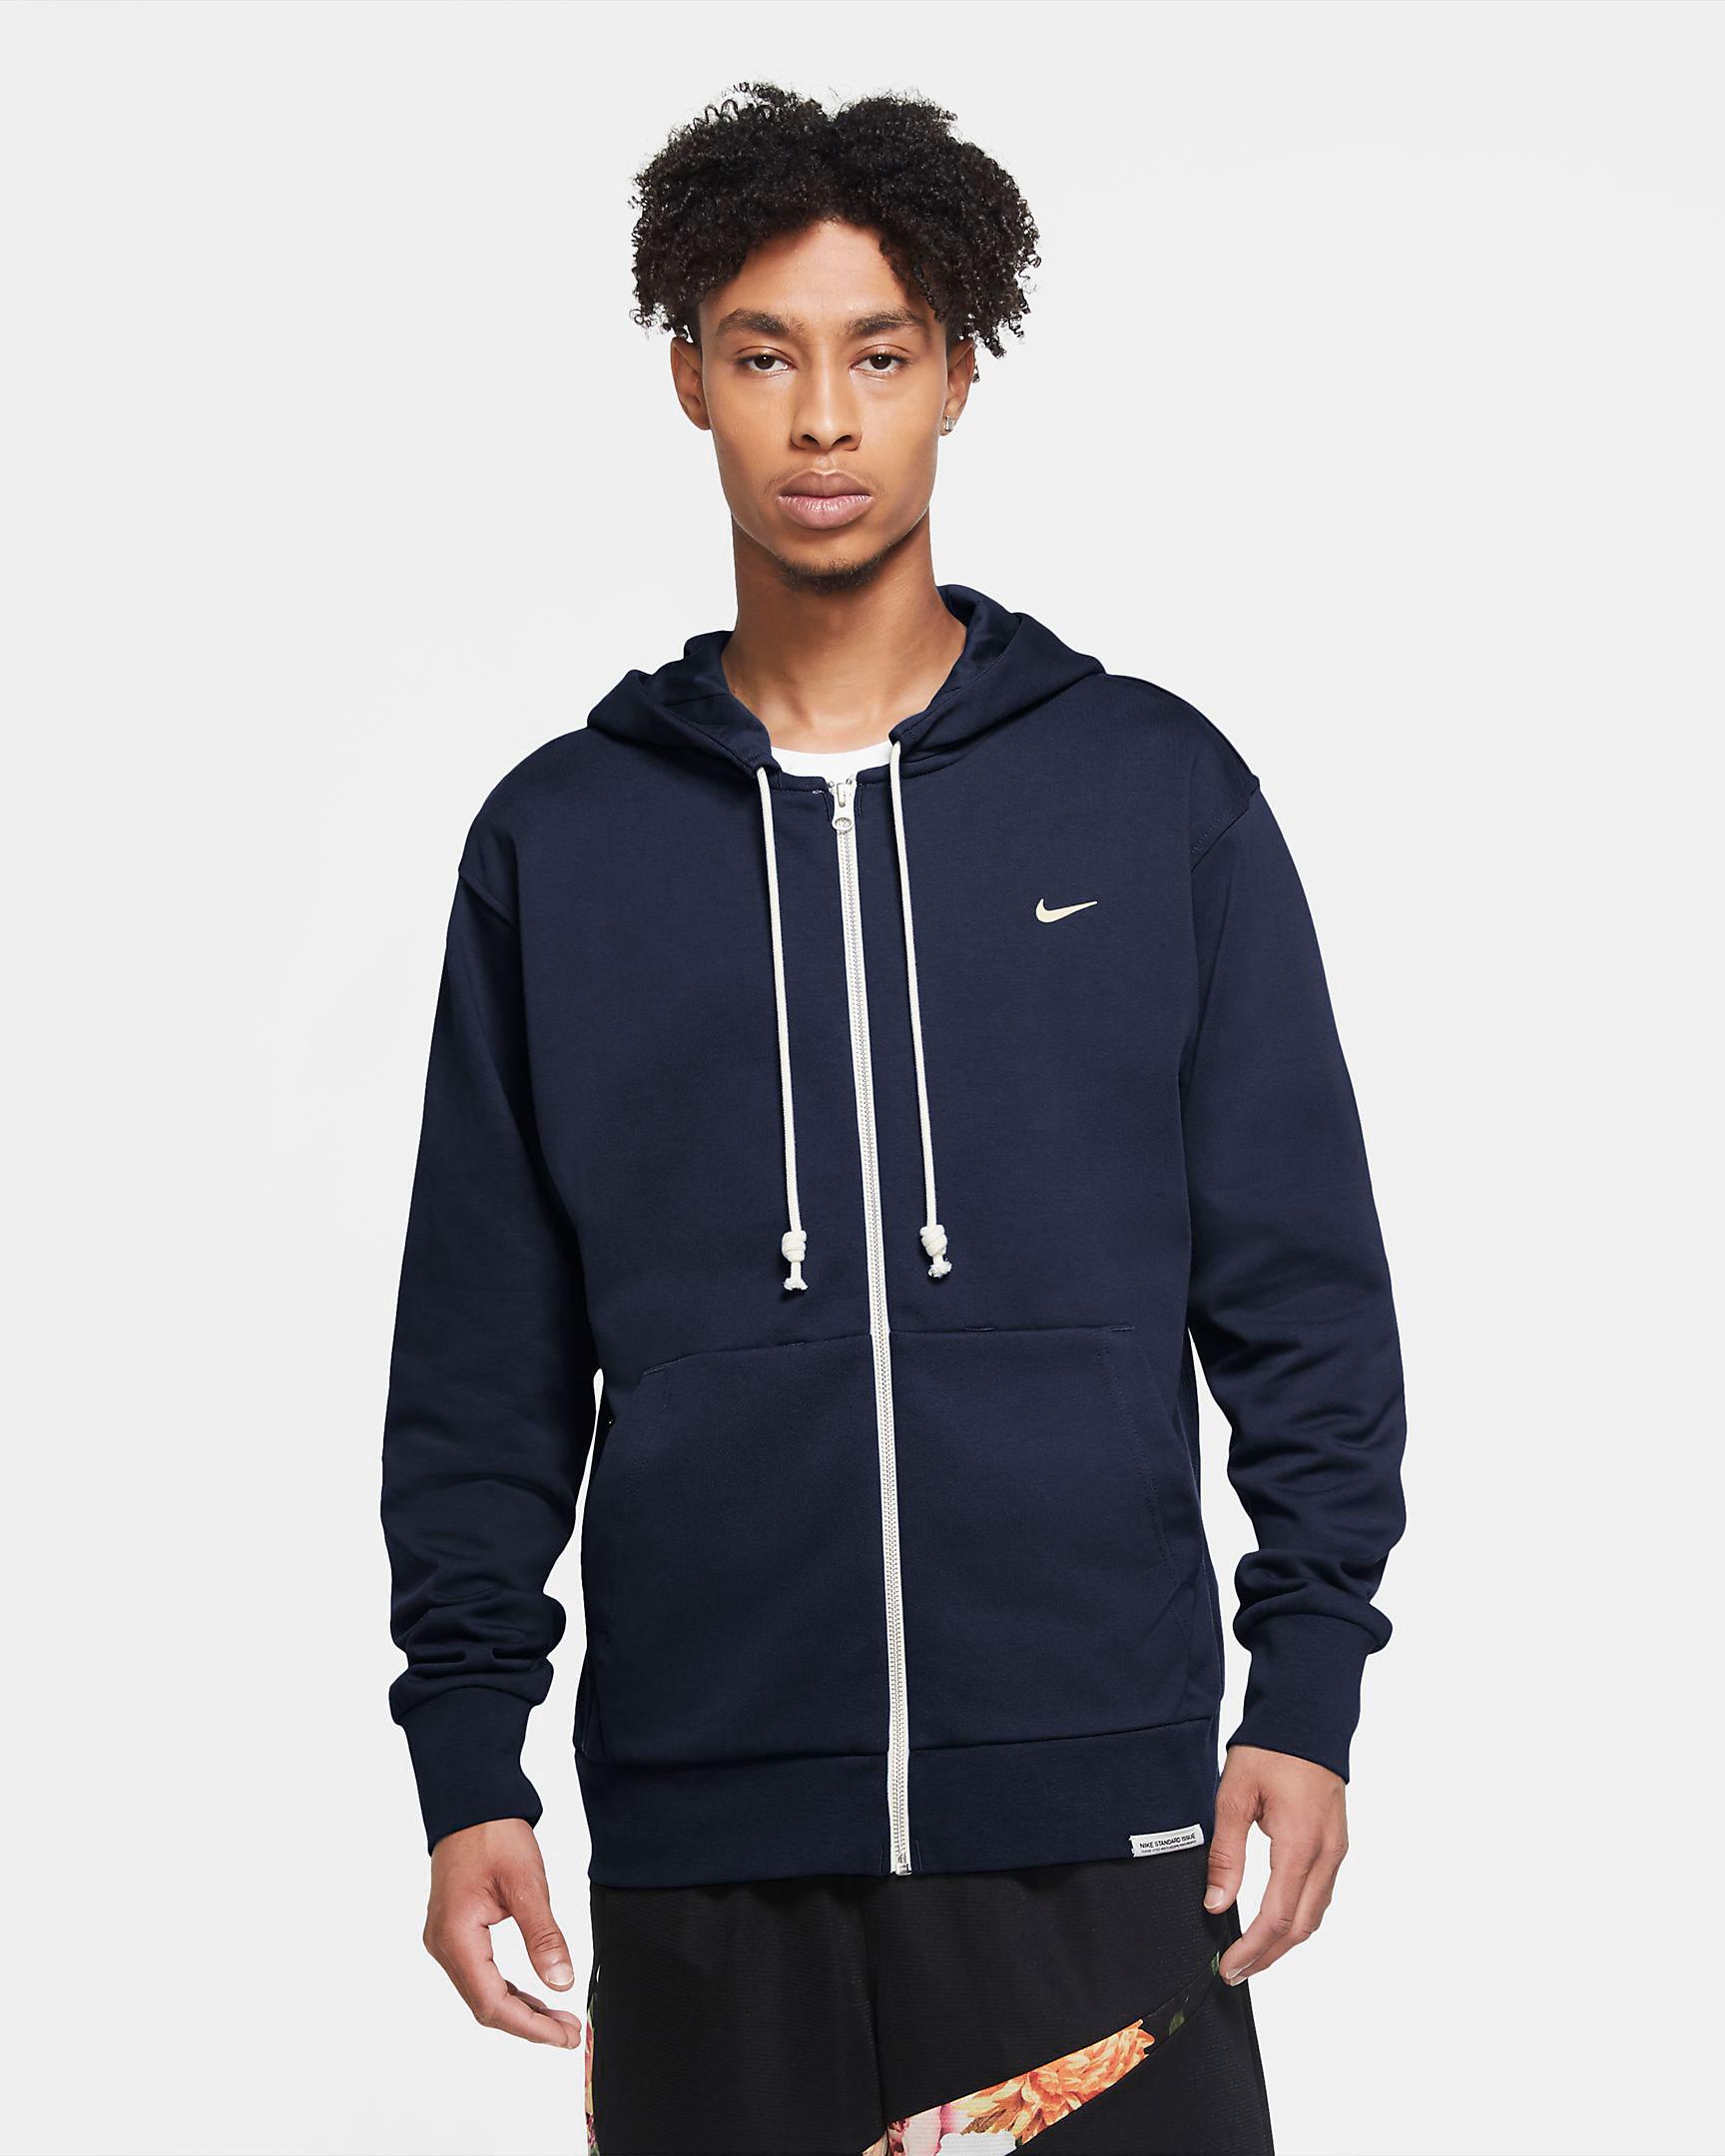 nike-lebron-17-graffiti-cold-blue-basketball-hoodie